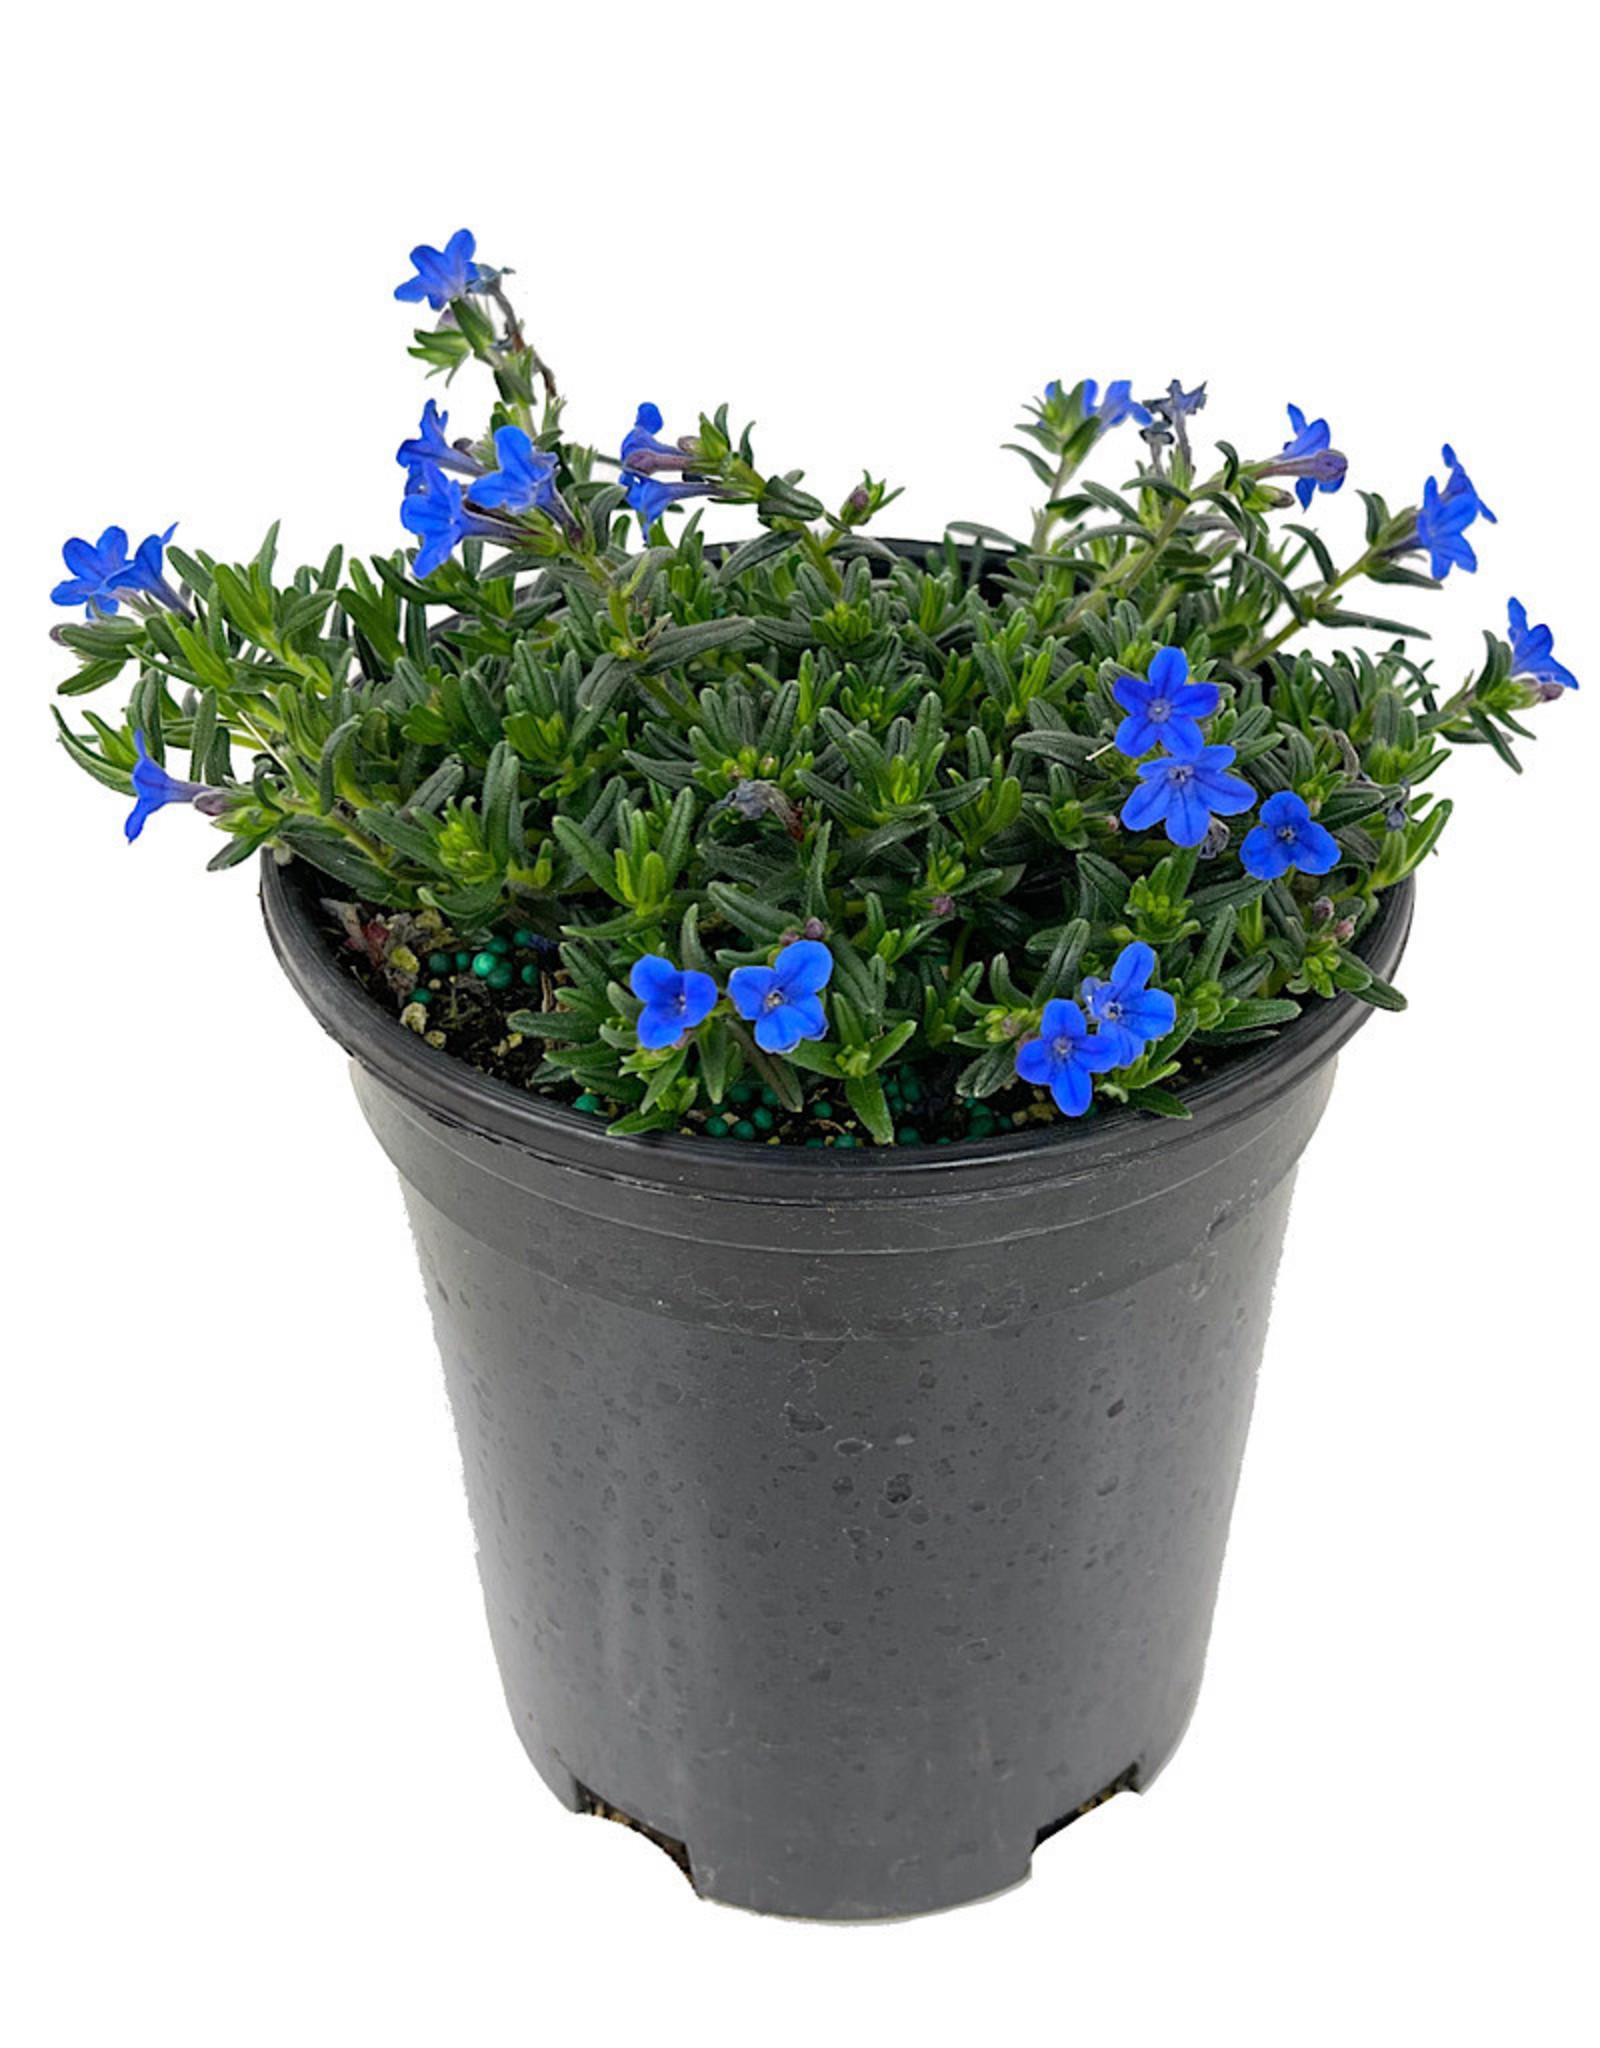 Lithodora diffusa 'Grace Ward' 1 Gallon